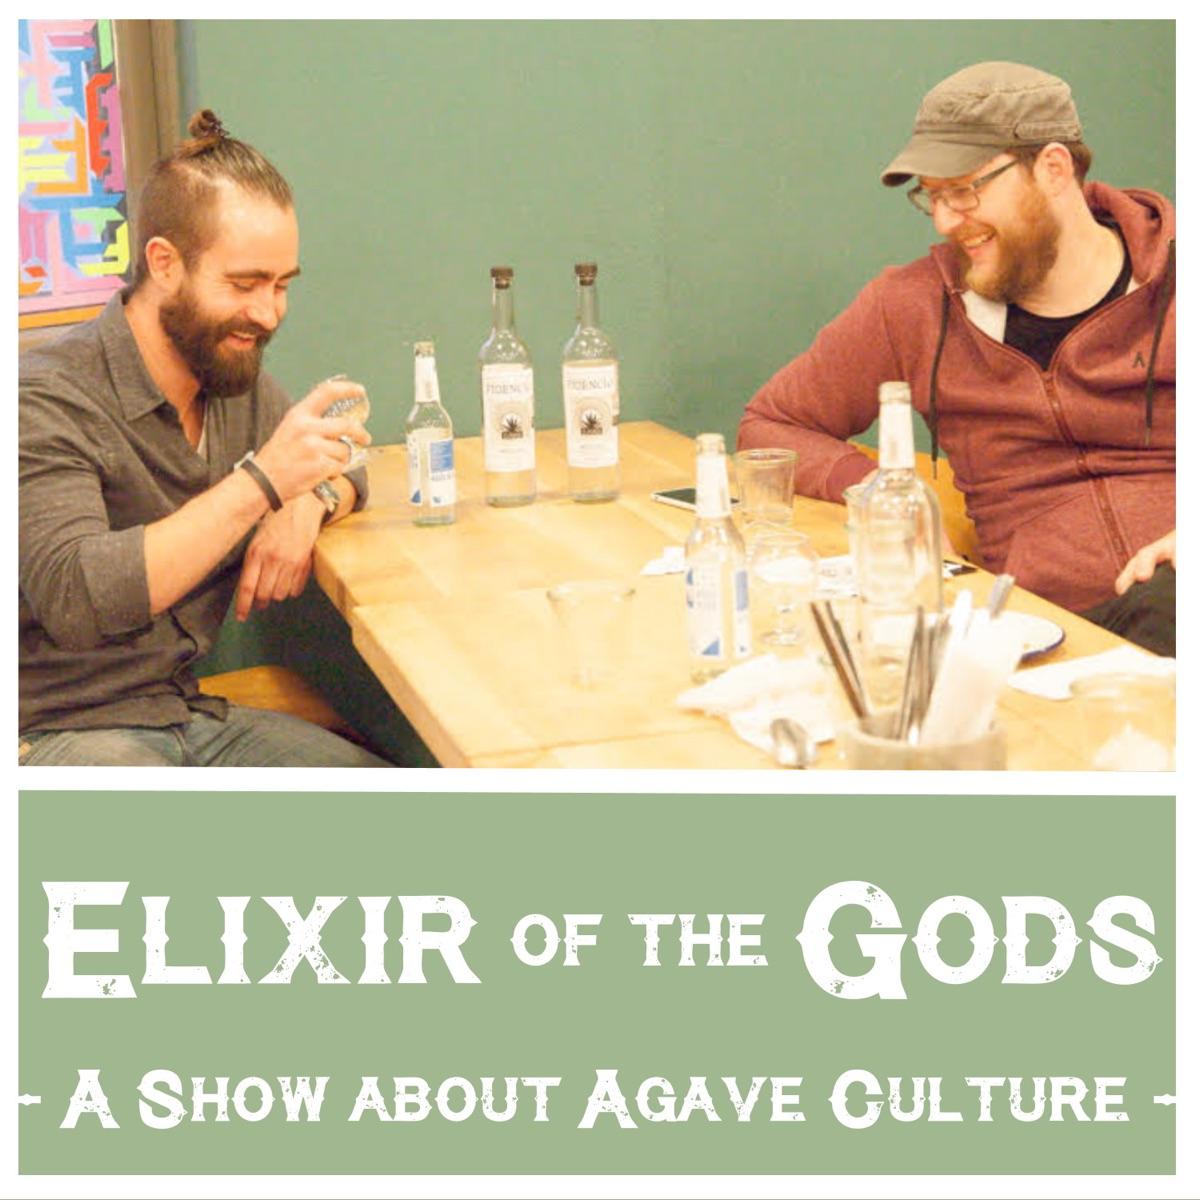 Elixir of the Gods